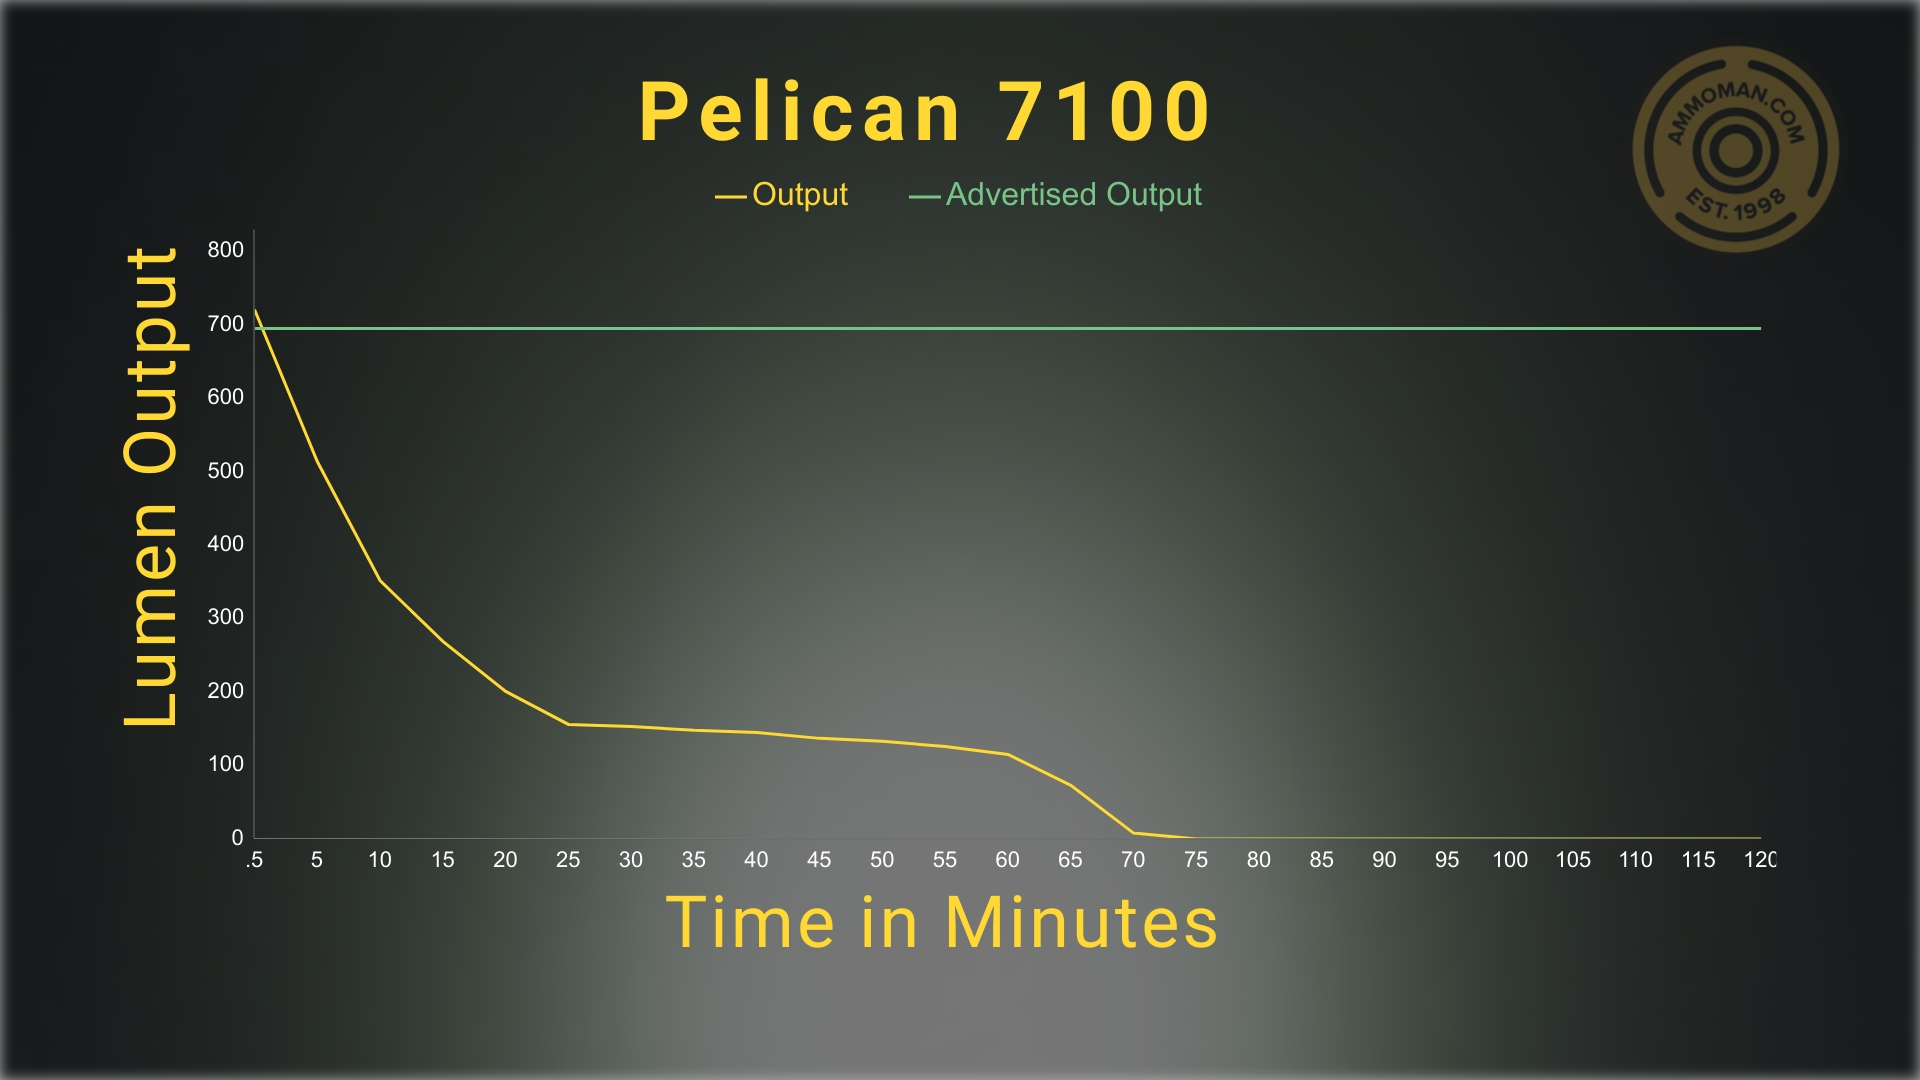 testing lumen output for the Pelican 7100 flashlight